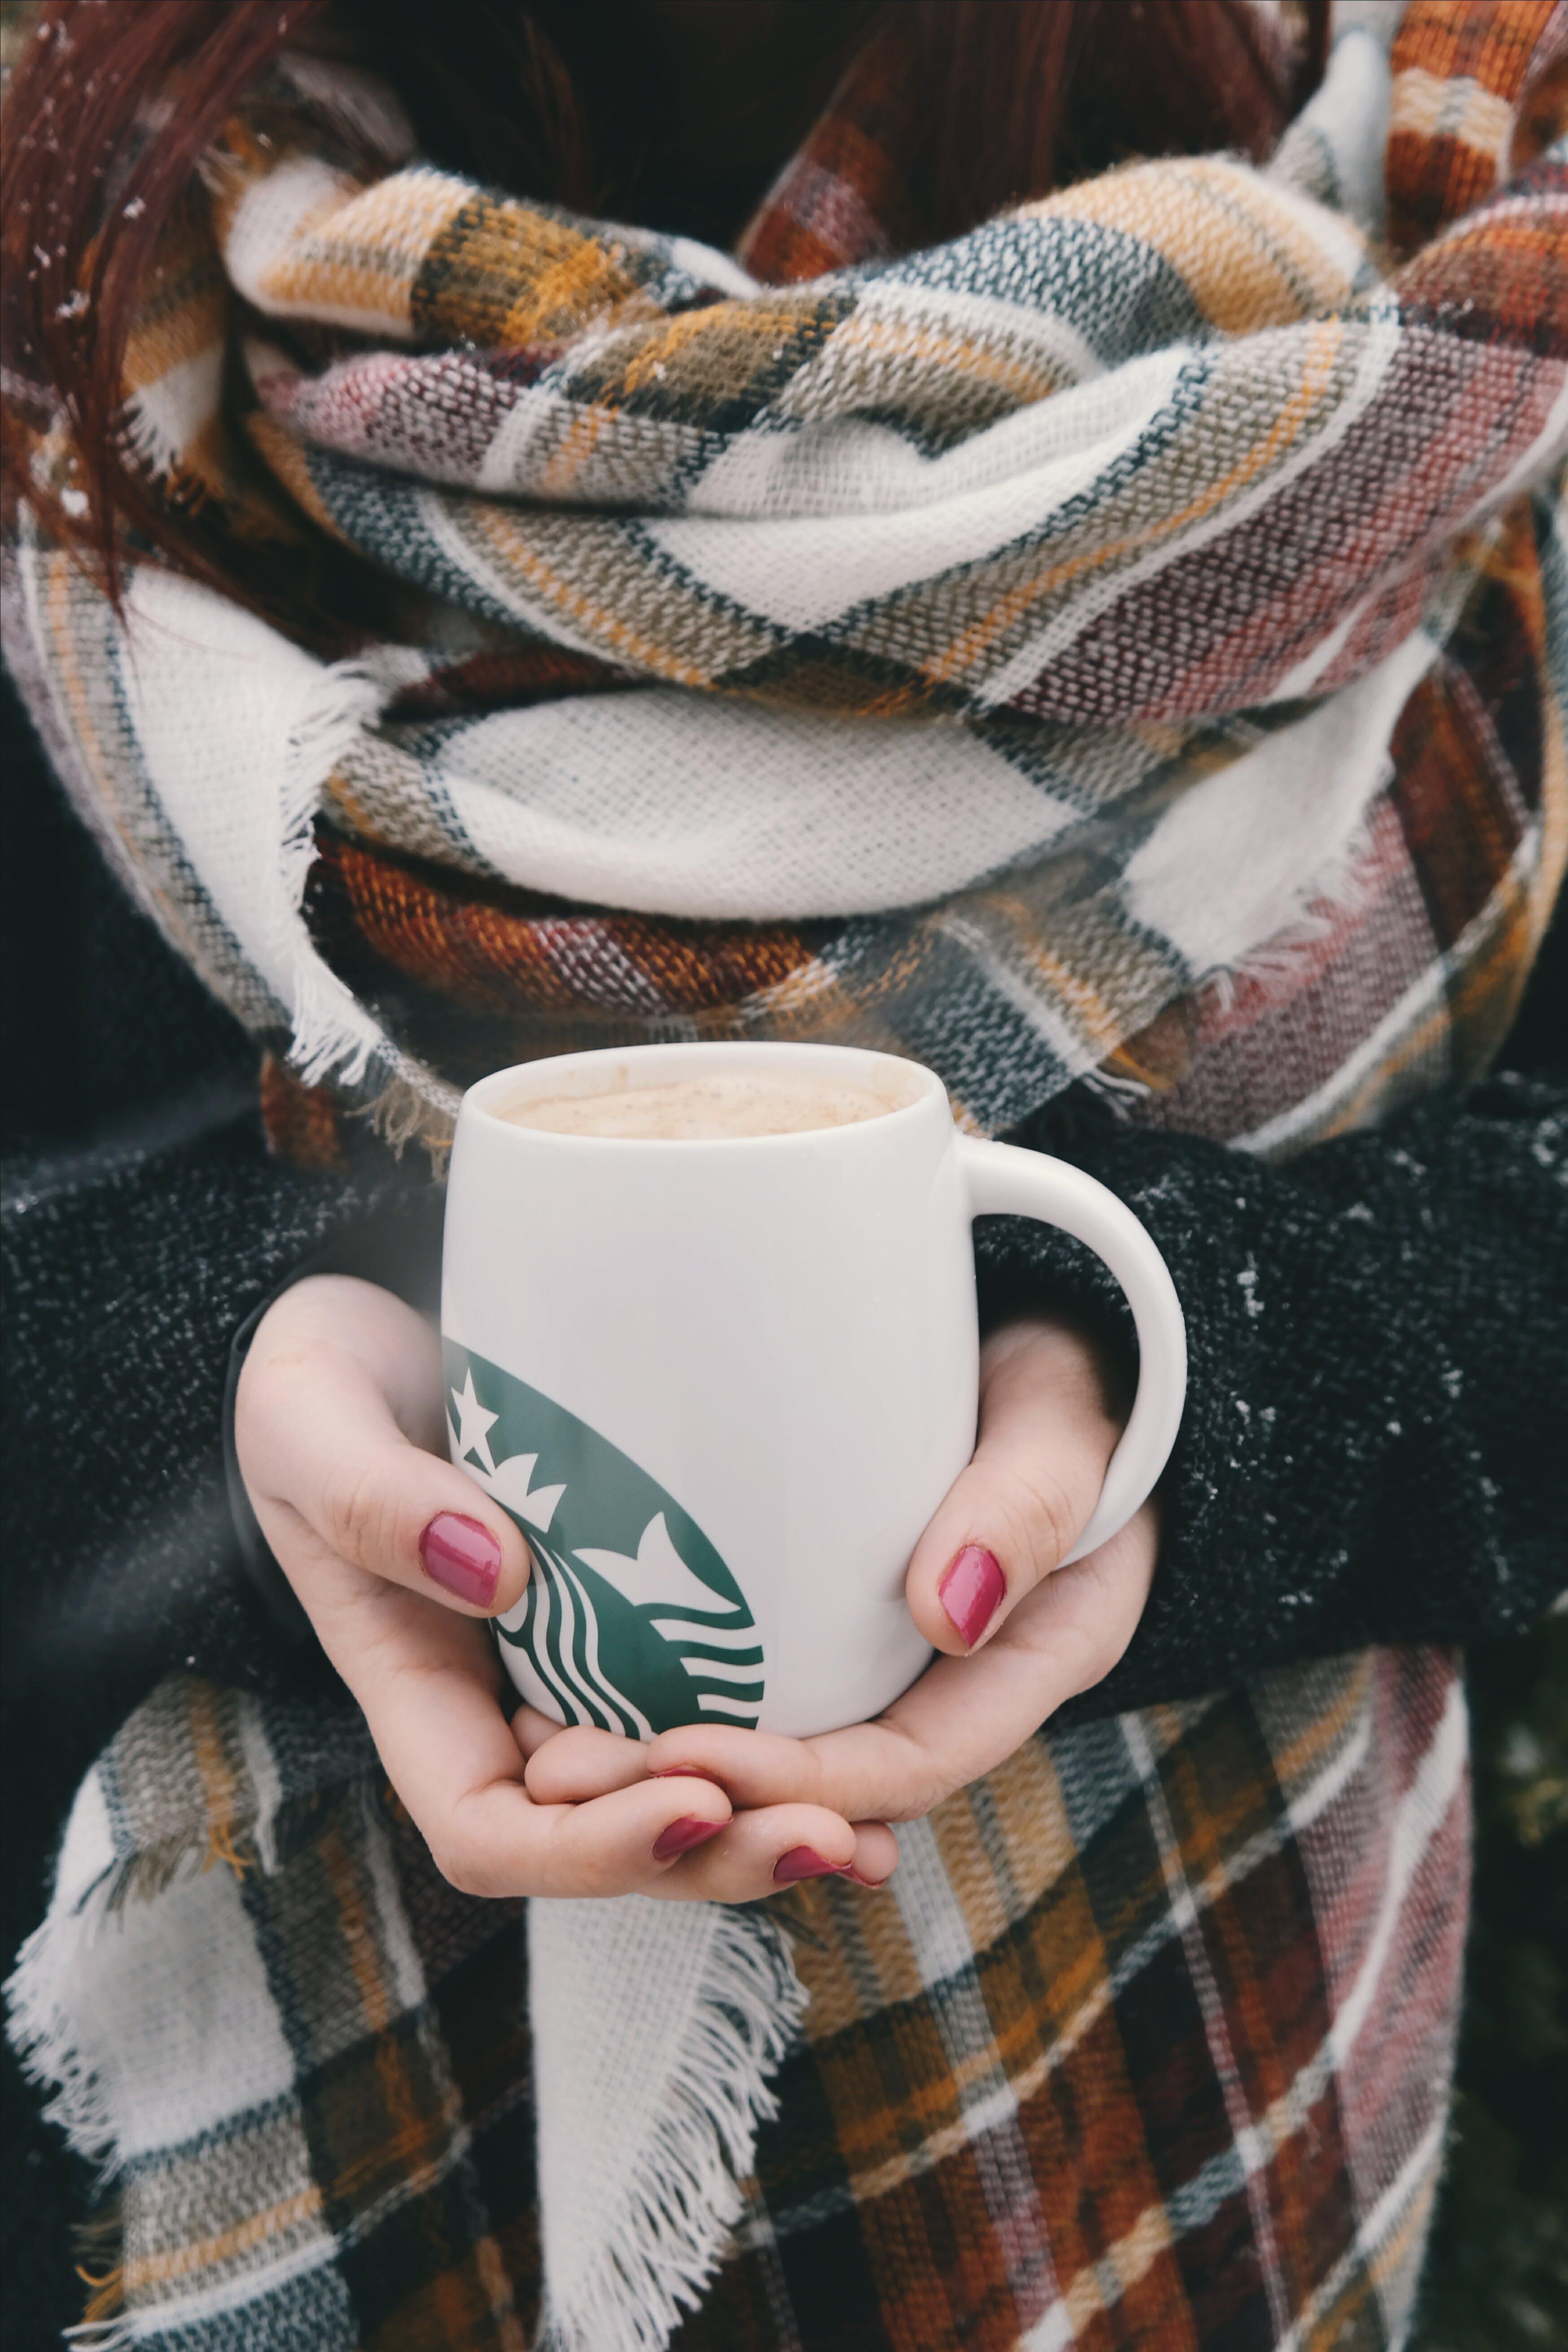 Person Holding White Starbucks Mug